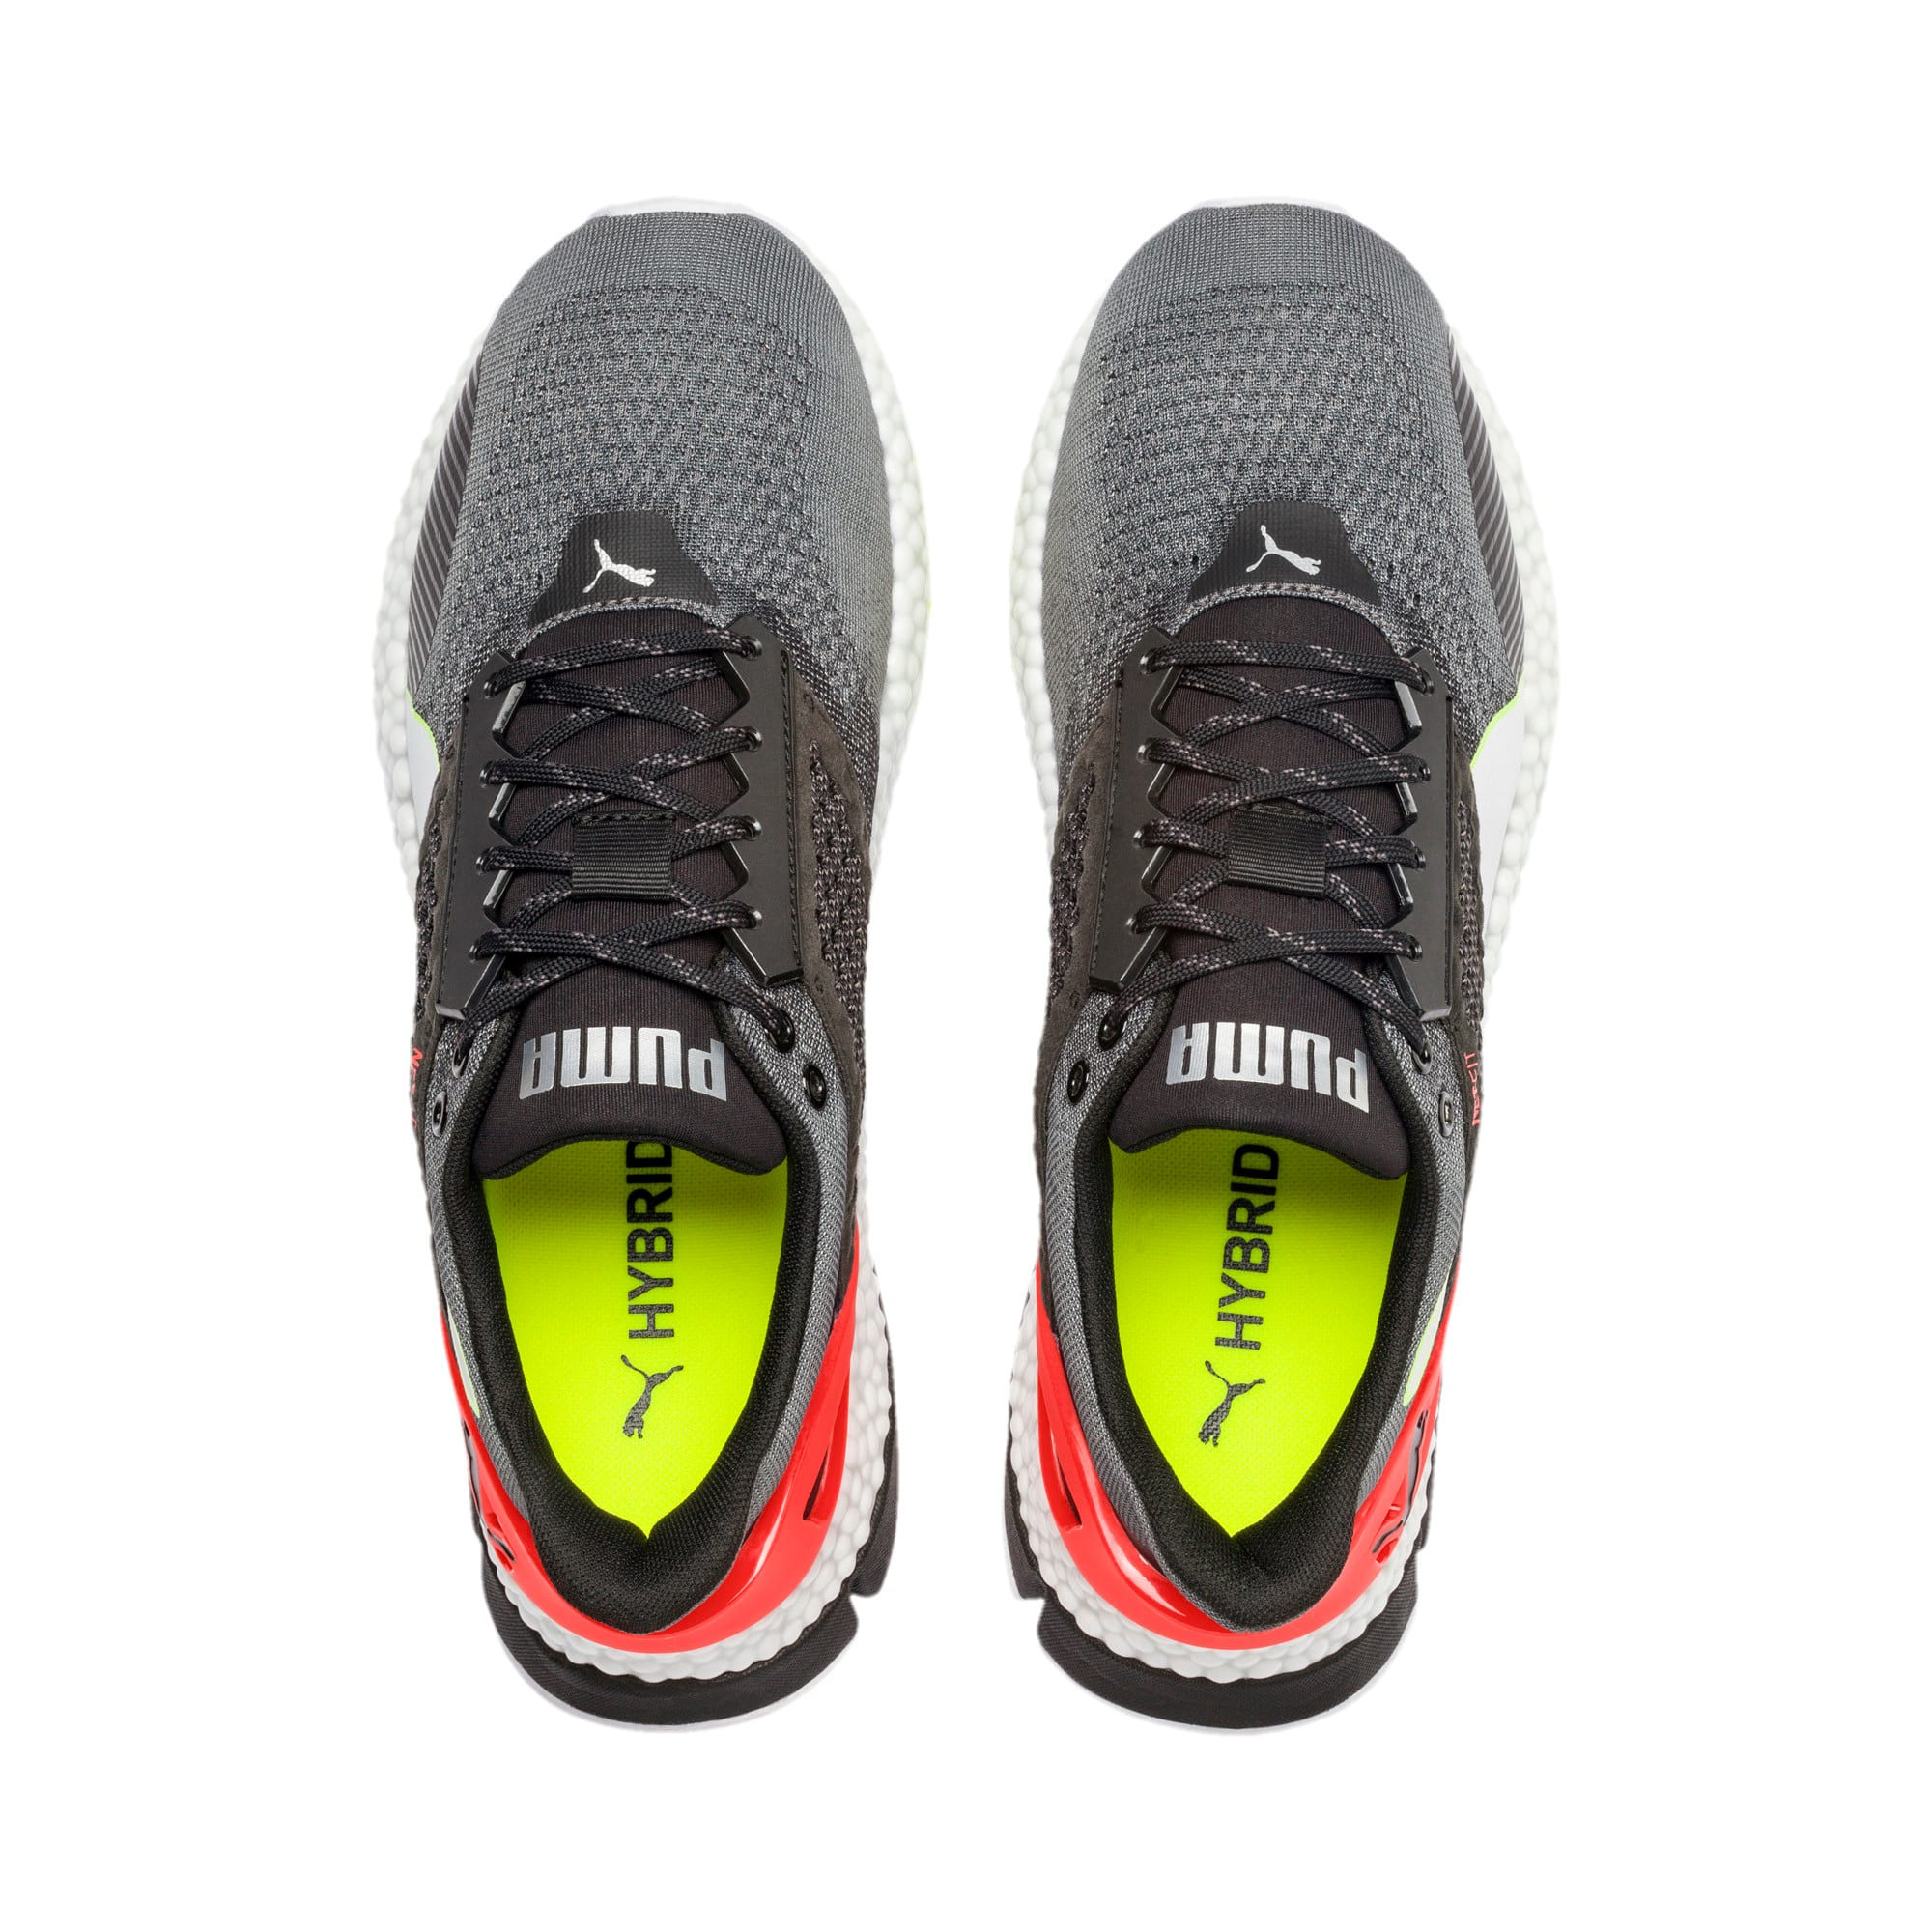 Thumbnail 4 of HYBRID NETFIT Astro Men's Running Shoes, CASTLEROCK-Puma Blck-Ngy Red, medium-IND